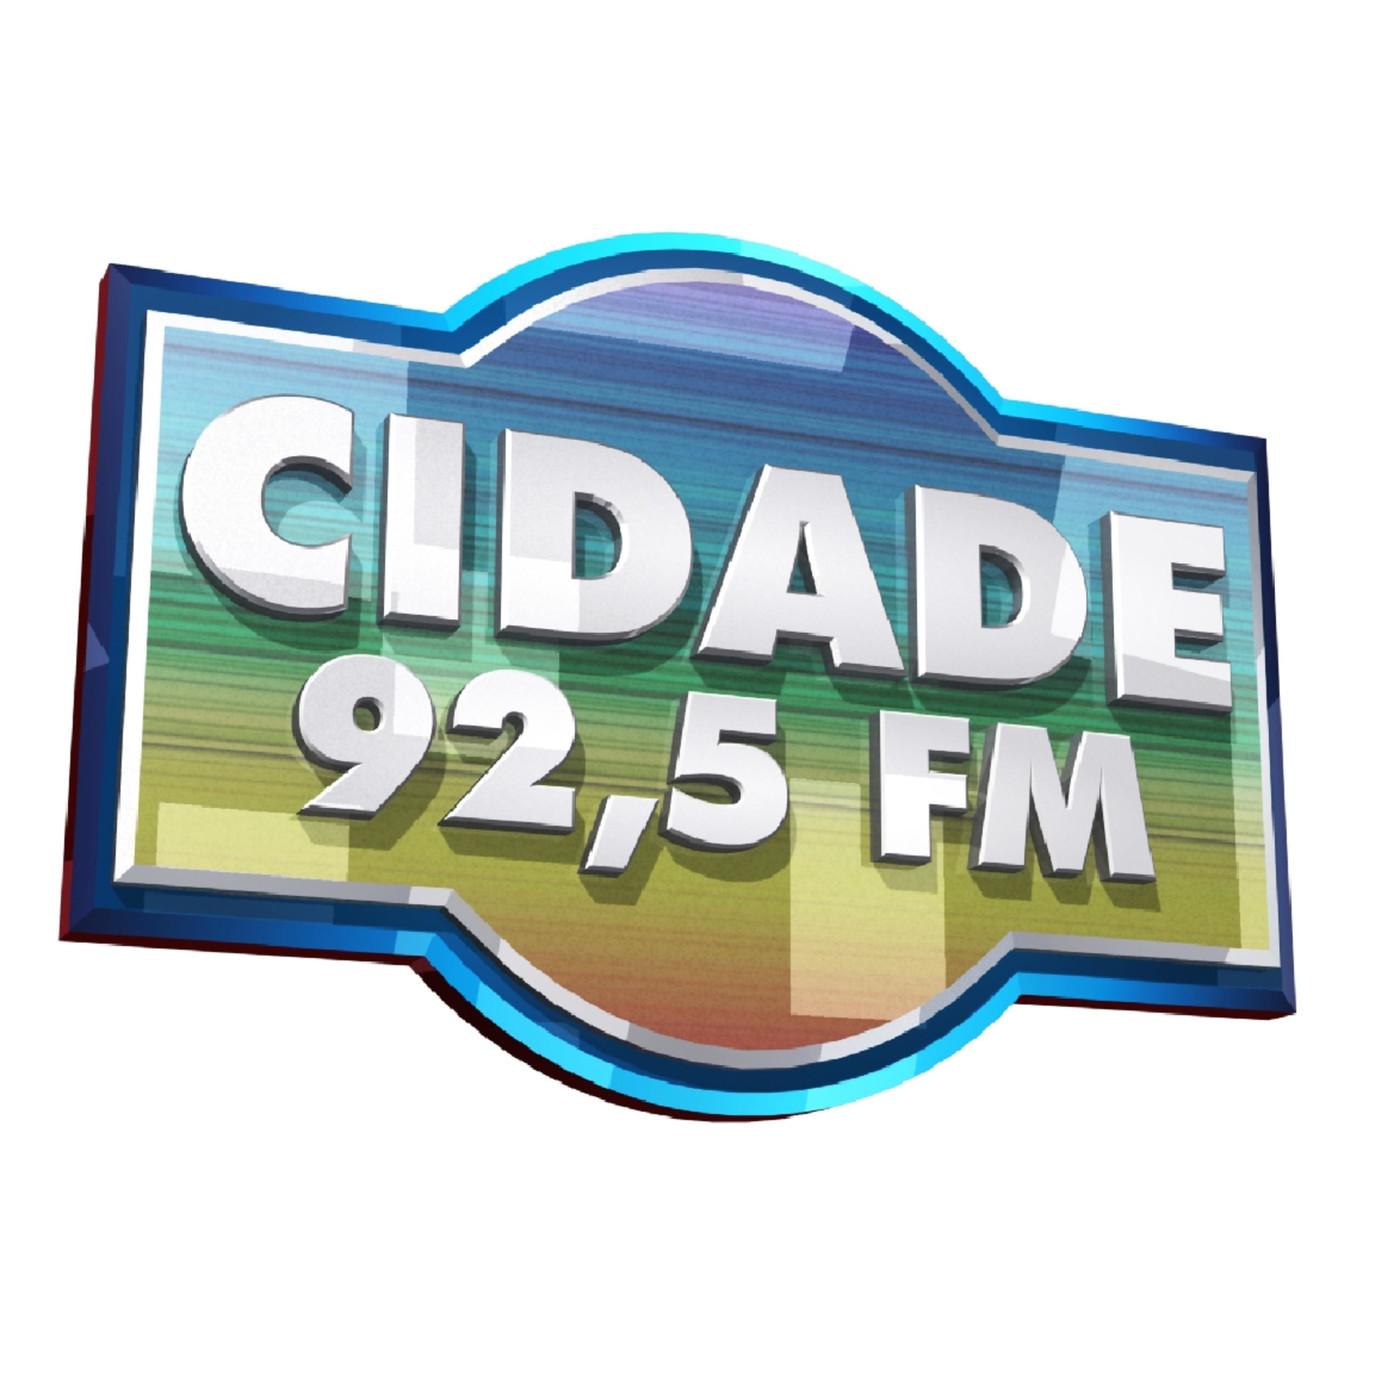 Radio Cidade 925 - Campinas